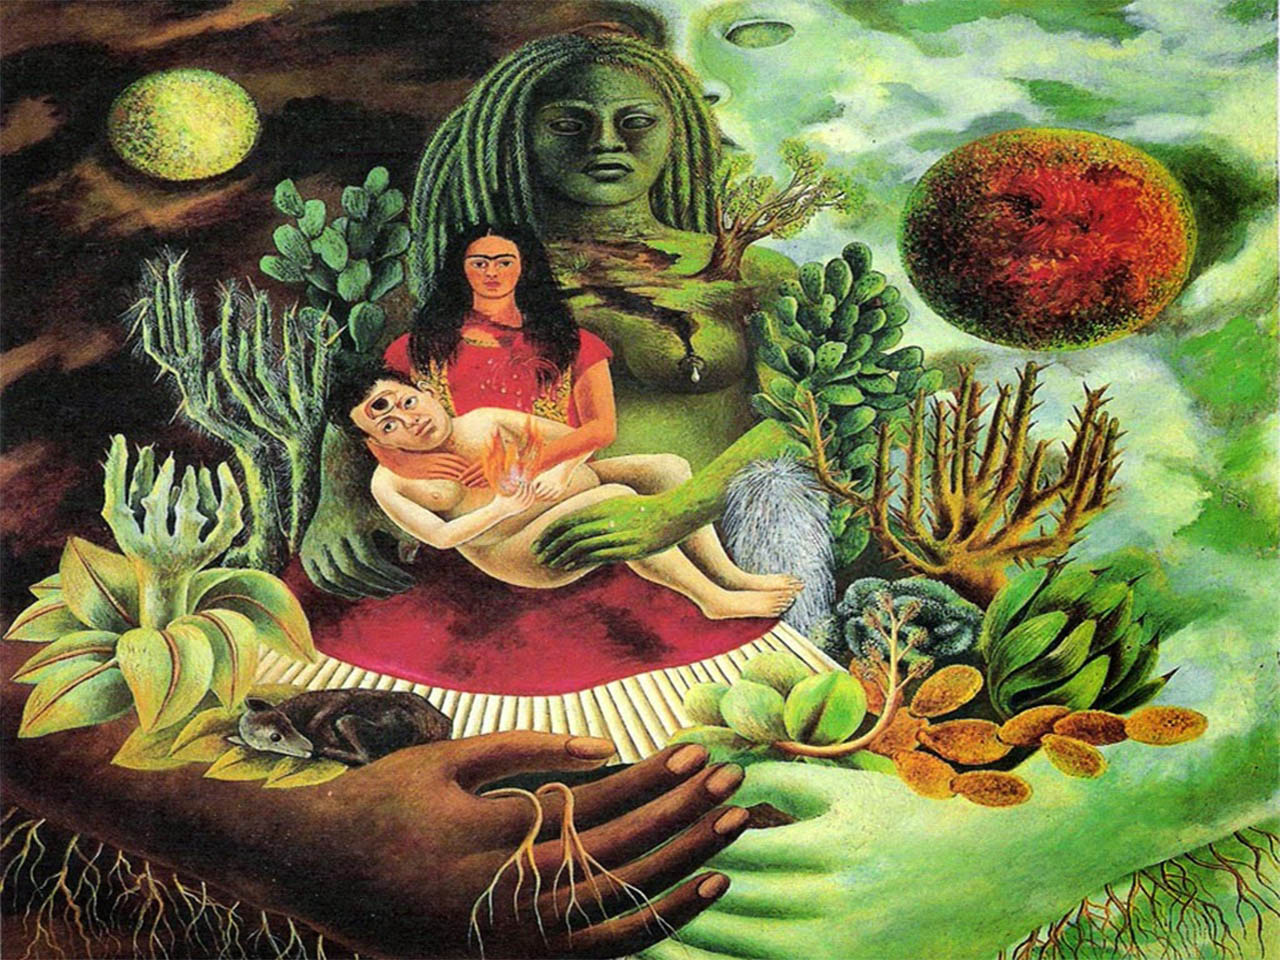 Frida Khalo<br> El abrazo de Amor del Universo. 1949